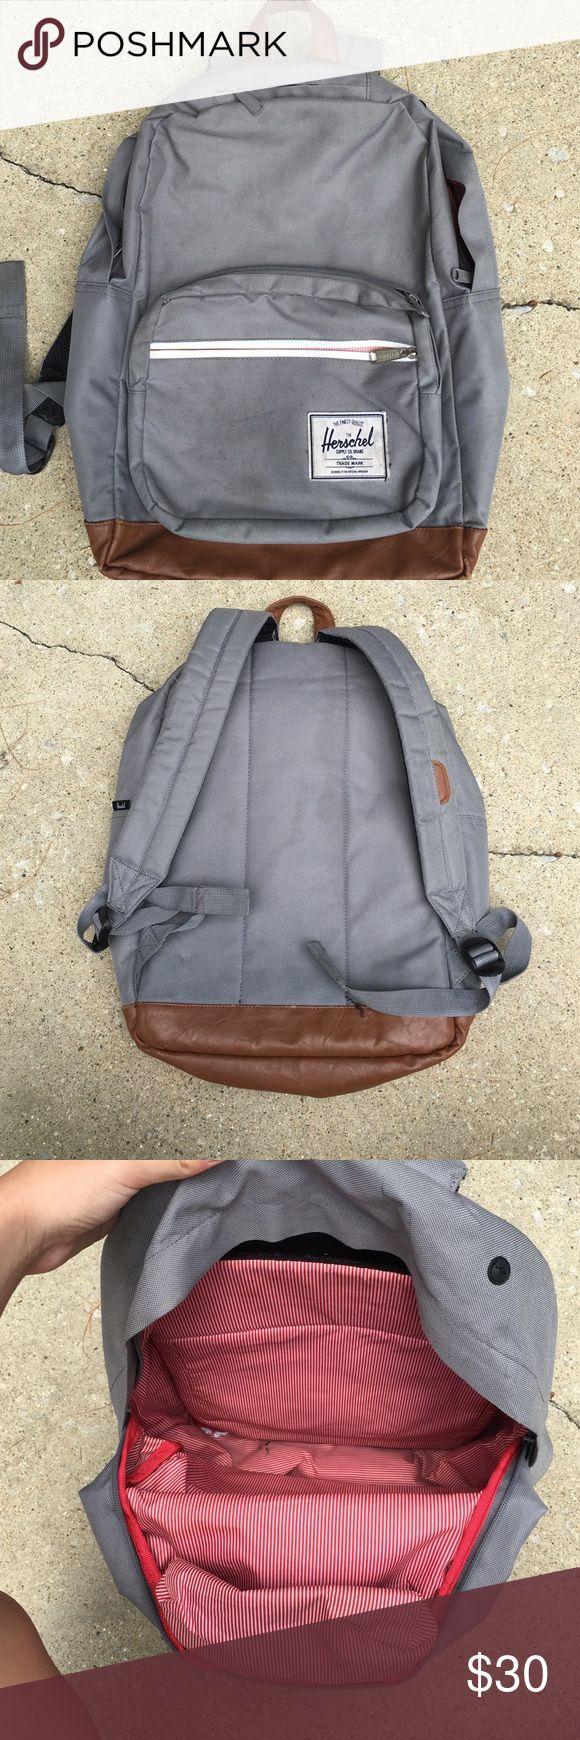 GREY HERSCHEL BACKPACK grey used, slight stain on …